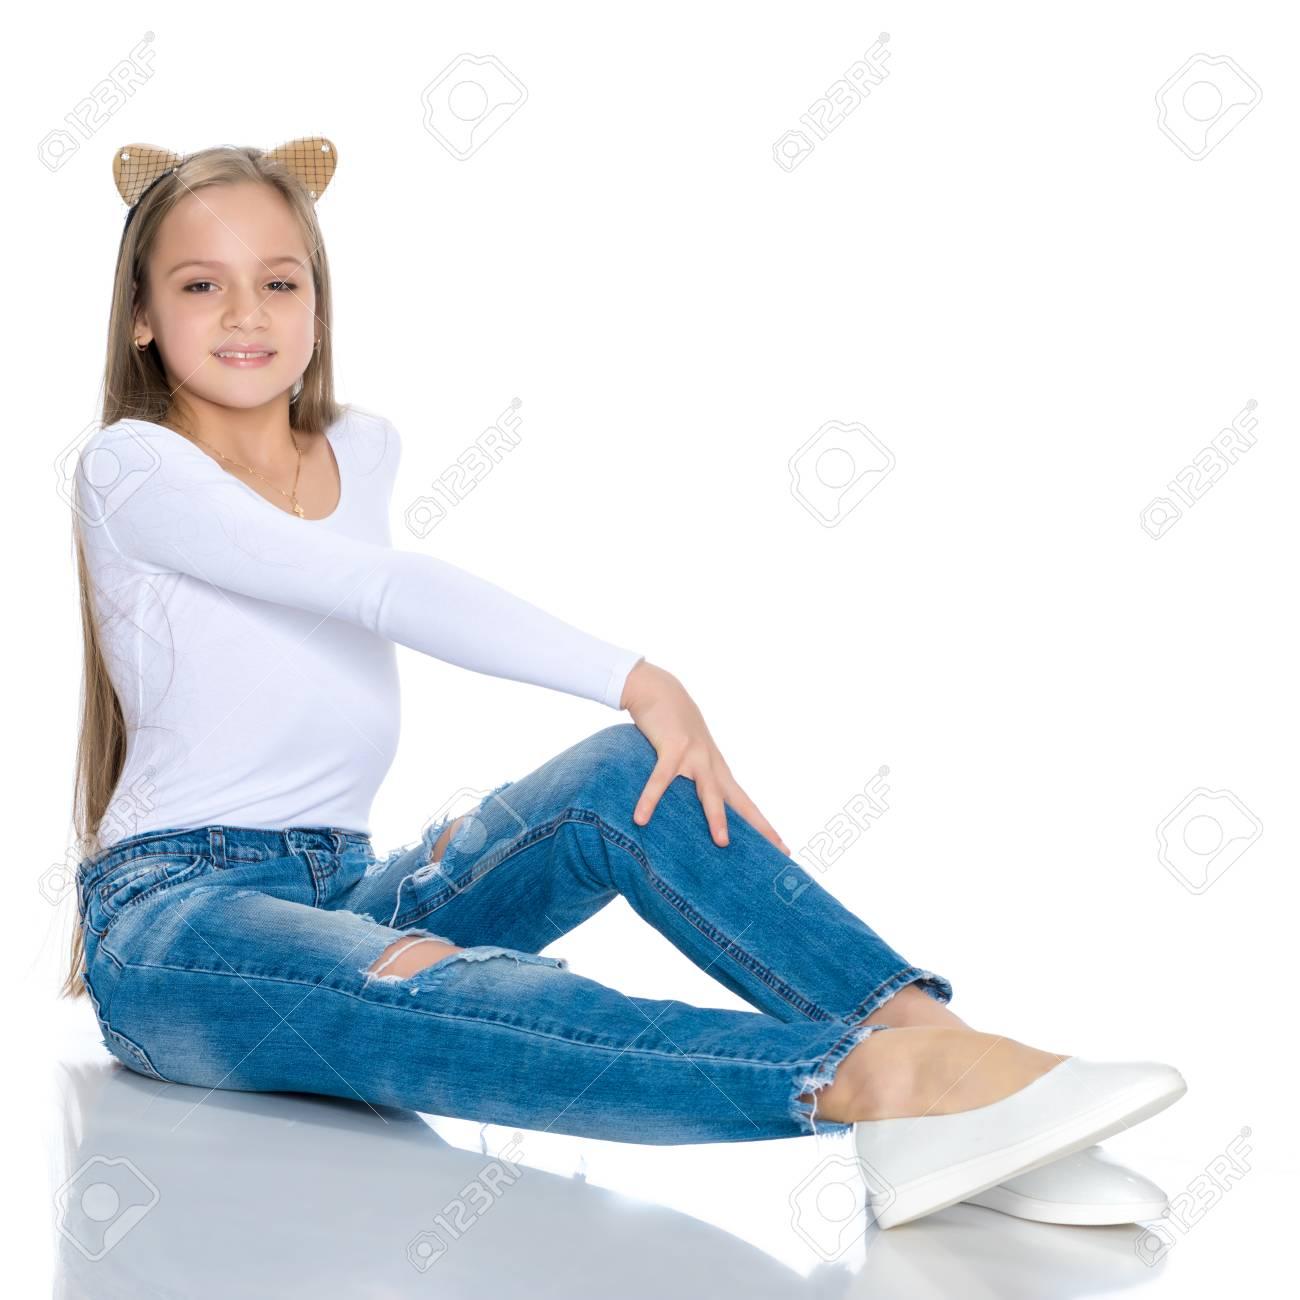 اجمل صور بنات 2020 اجمل صور بنات اطفال خلفيات بنات صغيره جميلة جدا 57